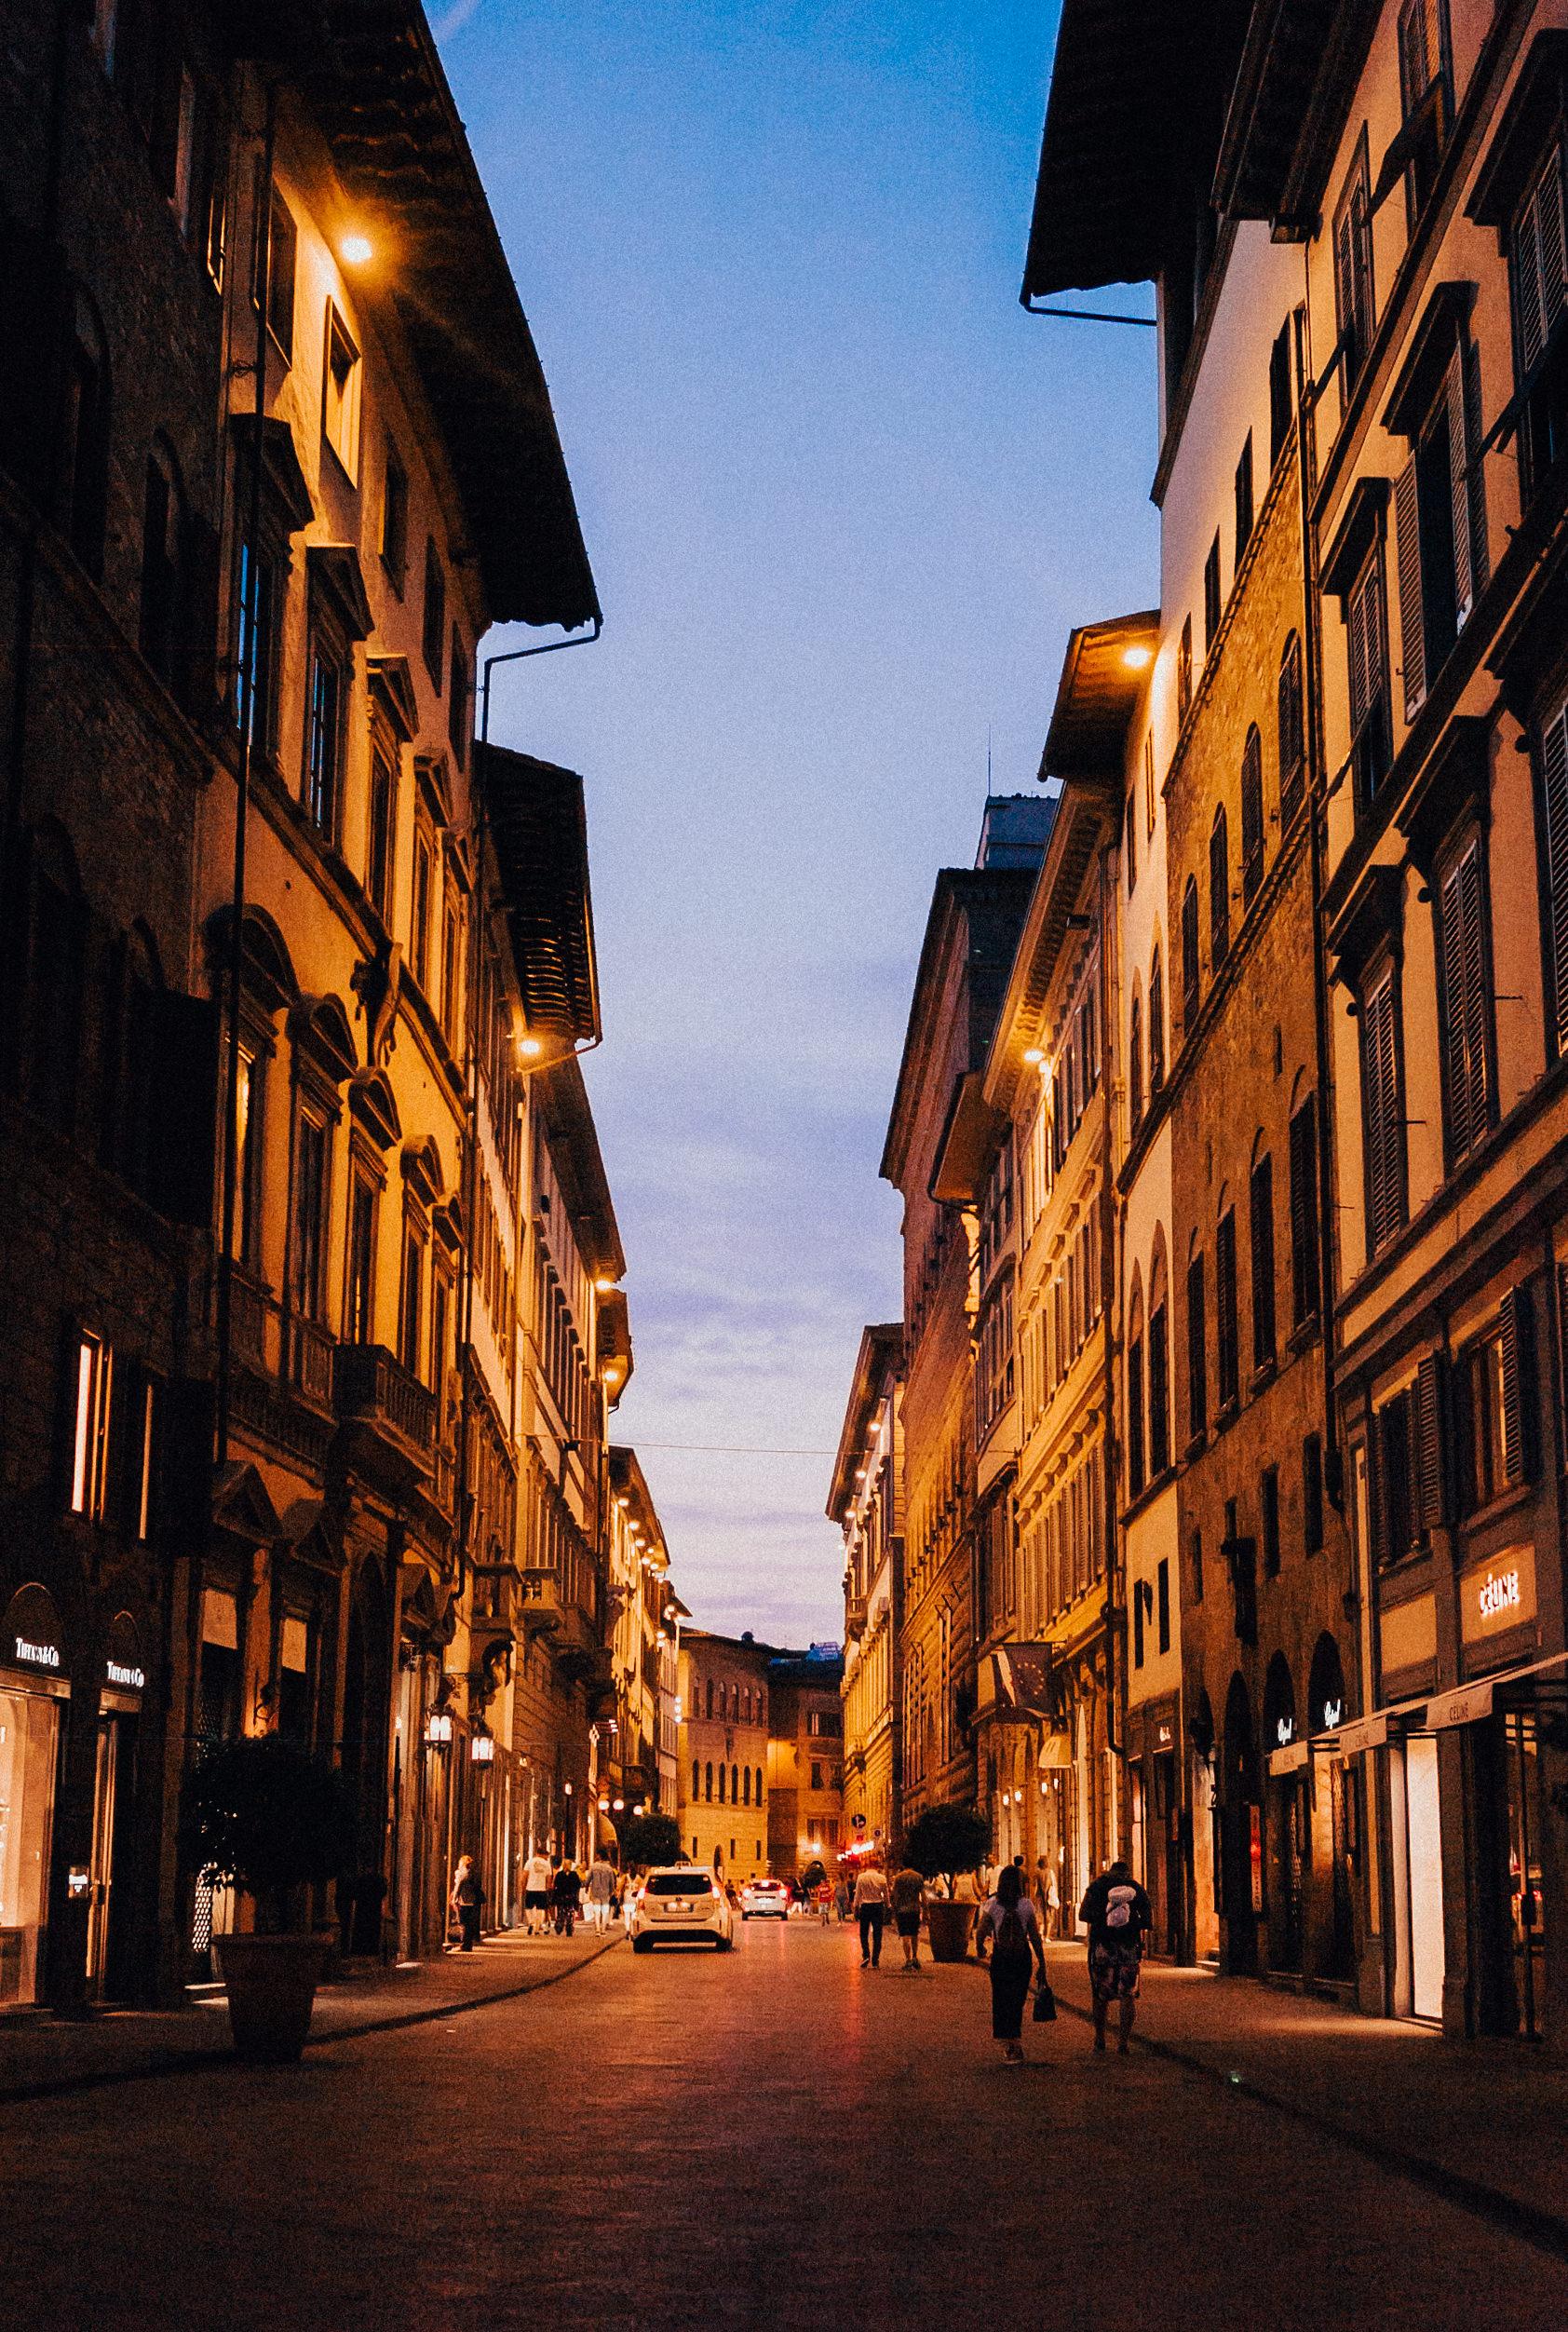 italy_travel_photography202.jpg